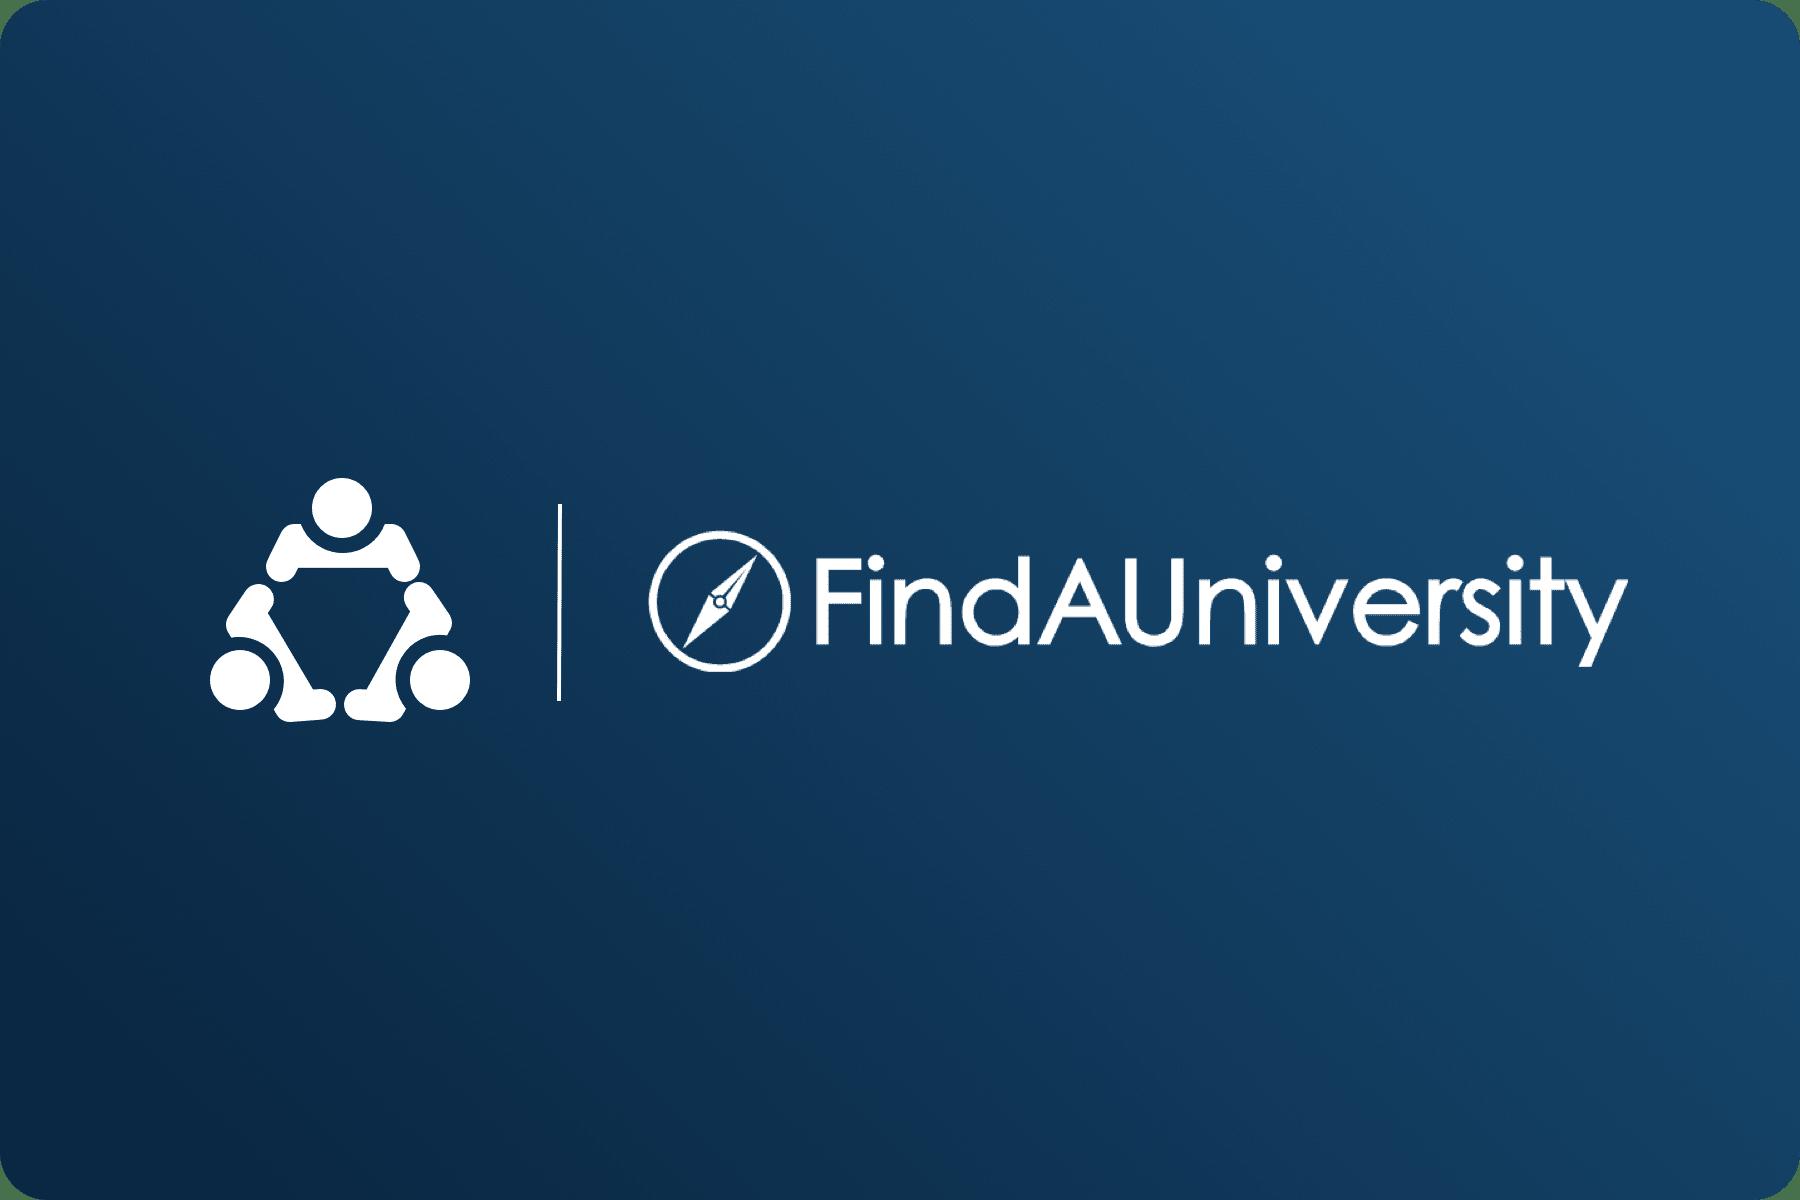 FindAUniversity